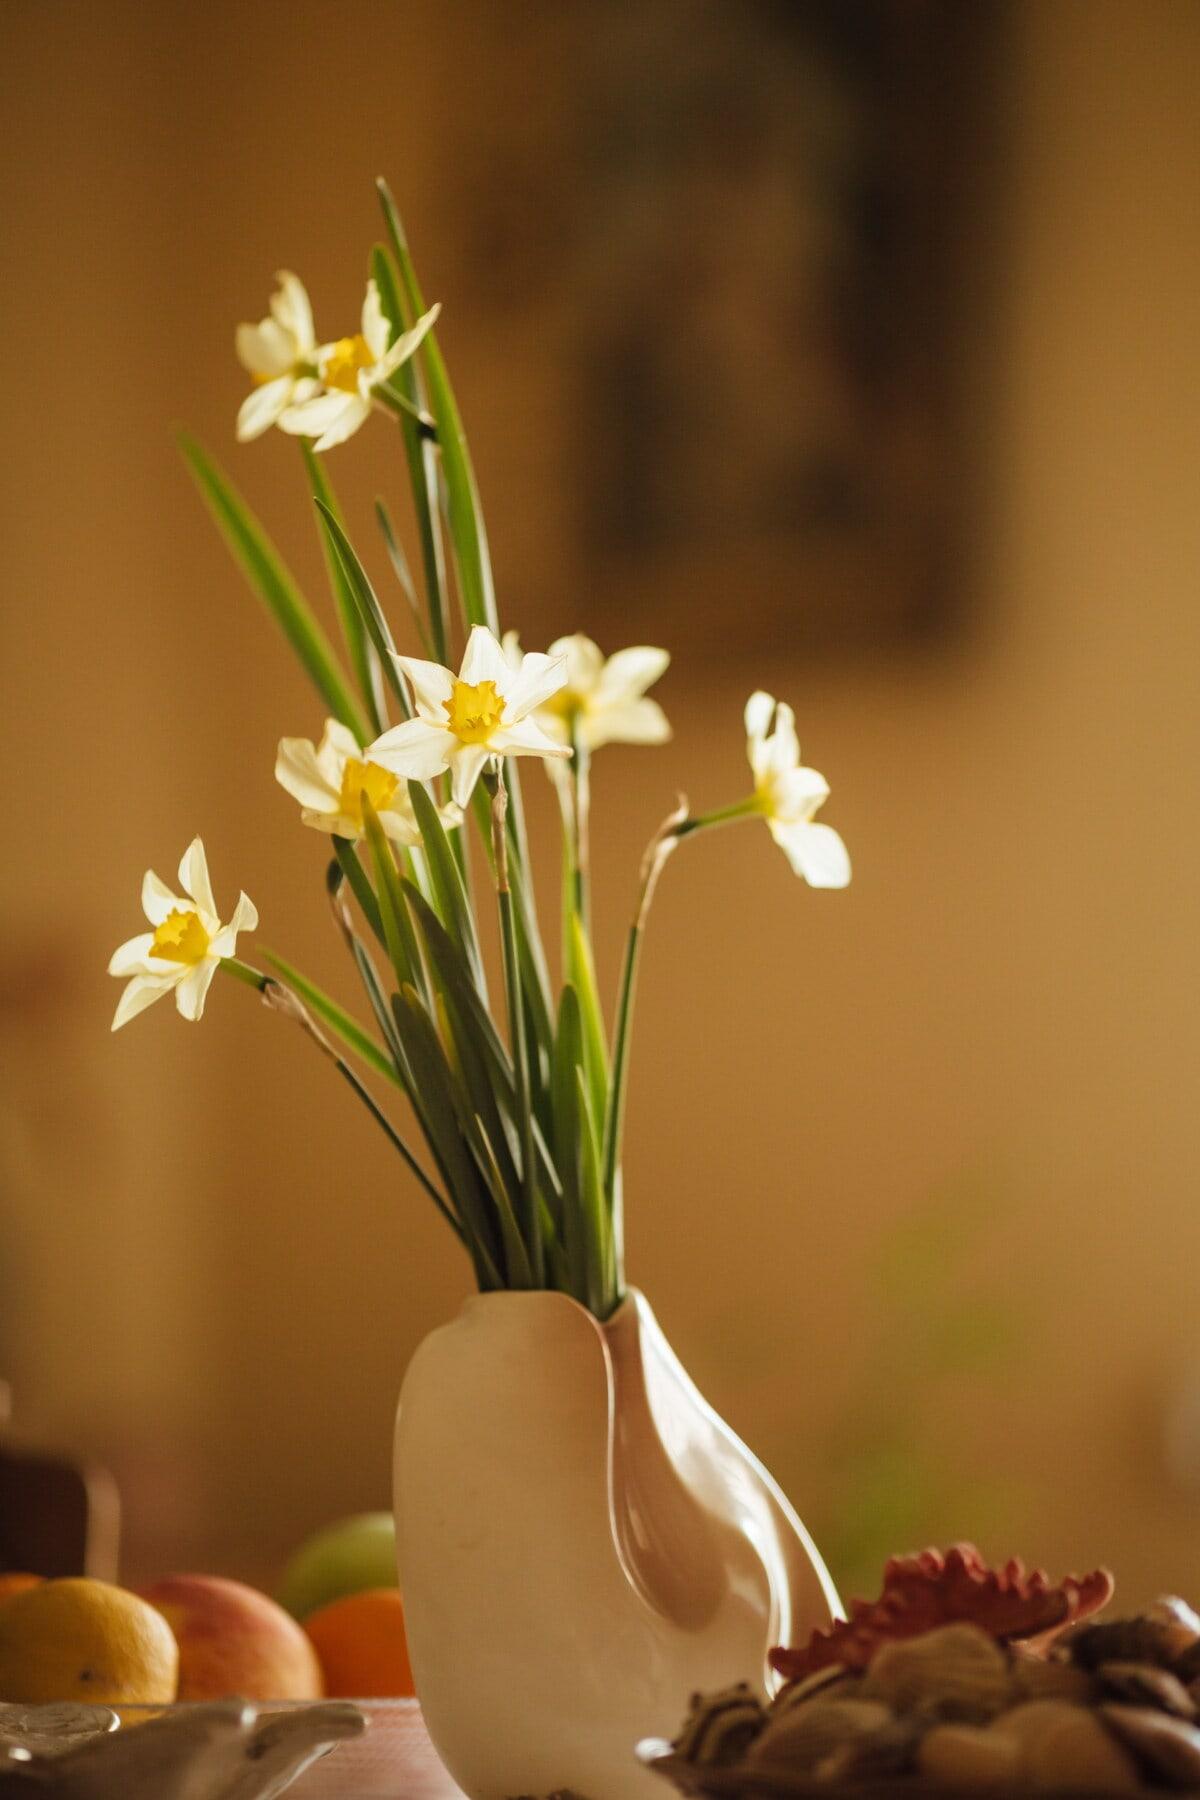 daffodil, vase, interior decoration, still life, narcissus, nature, blossom, plant, spring, flower